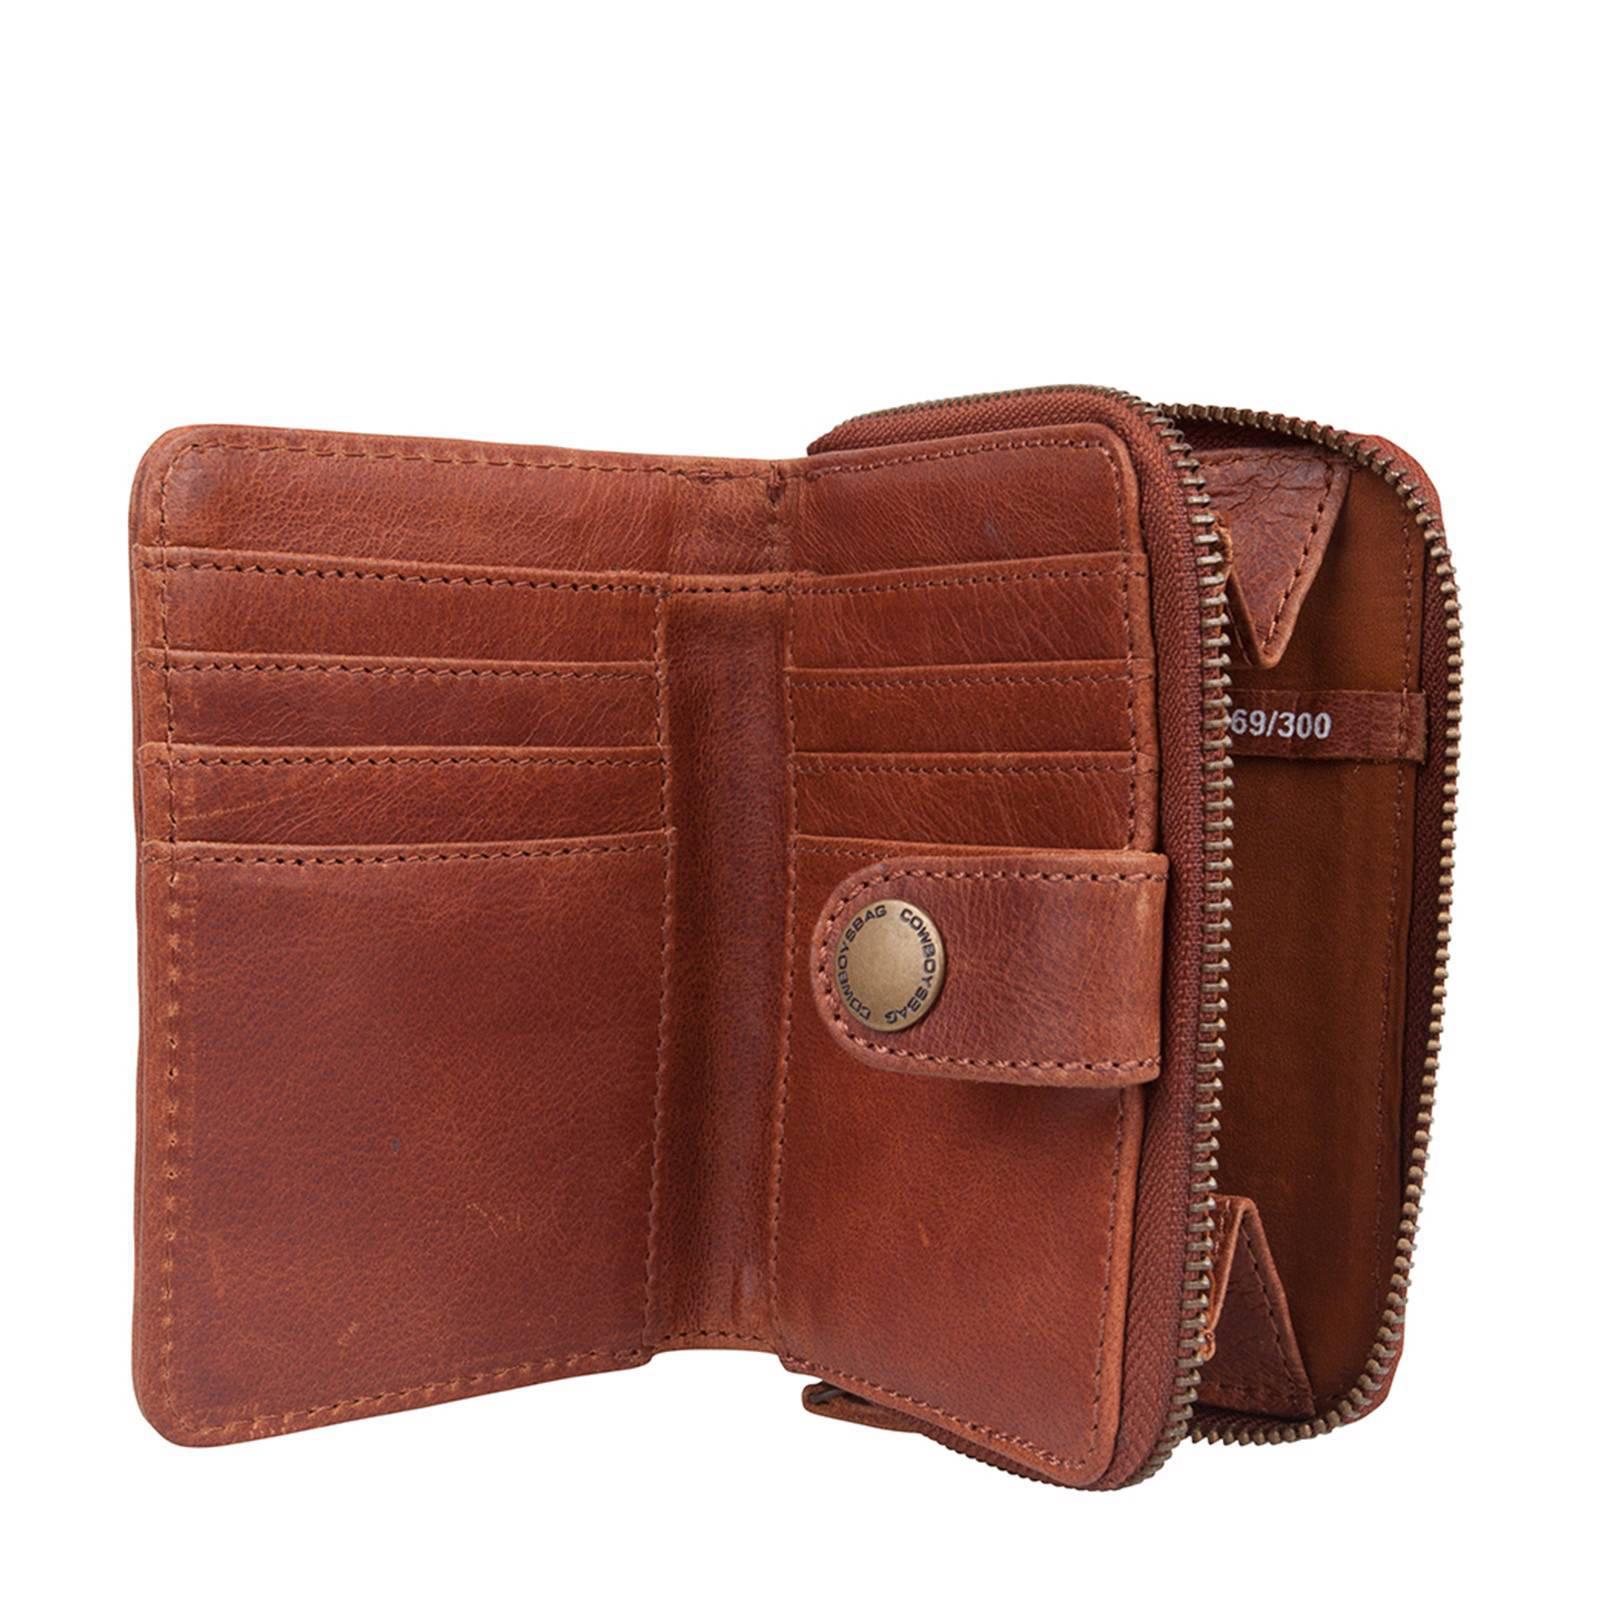 edb66d641cd Cowboysbag leren portemonnee Purse Haxby | wehkamp